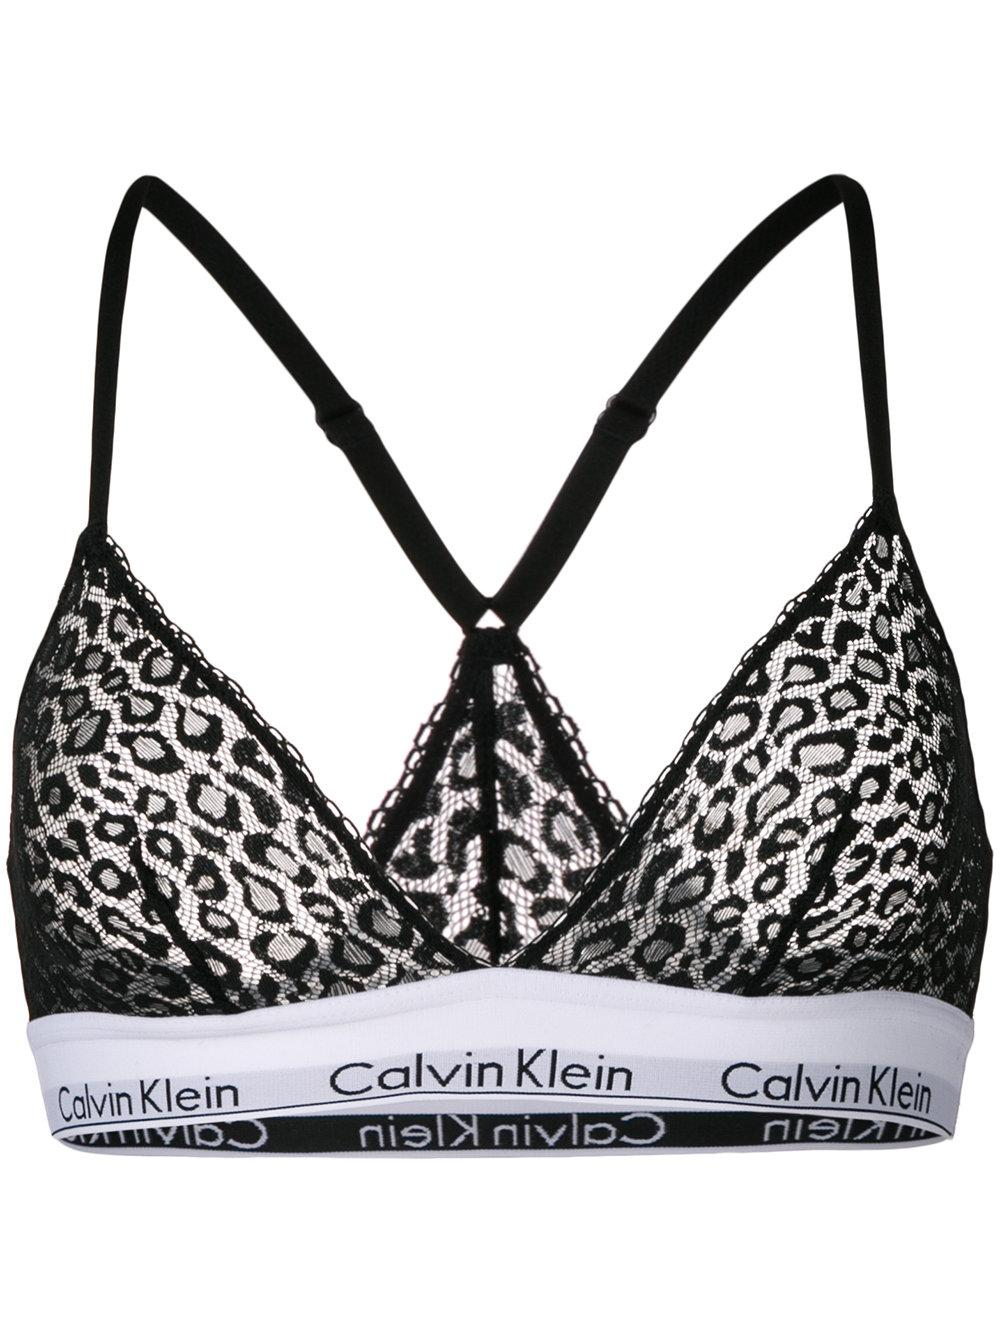 891c46d5d3fdd Calvin Klein Underwear Leopard Mesh Unlined Bra